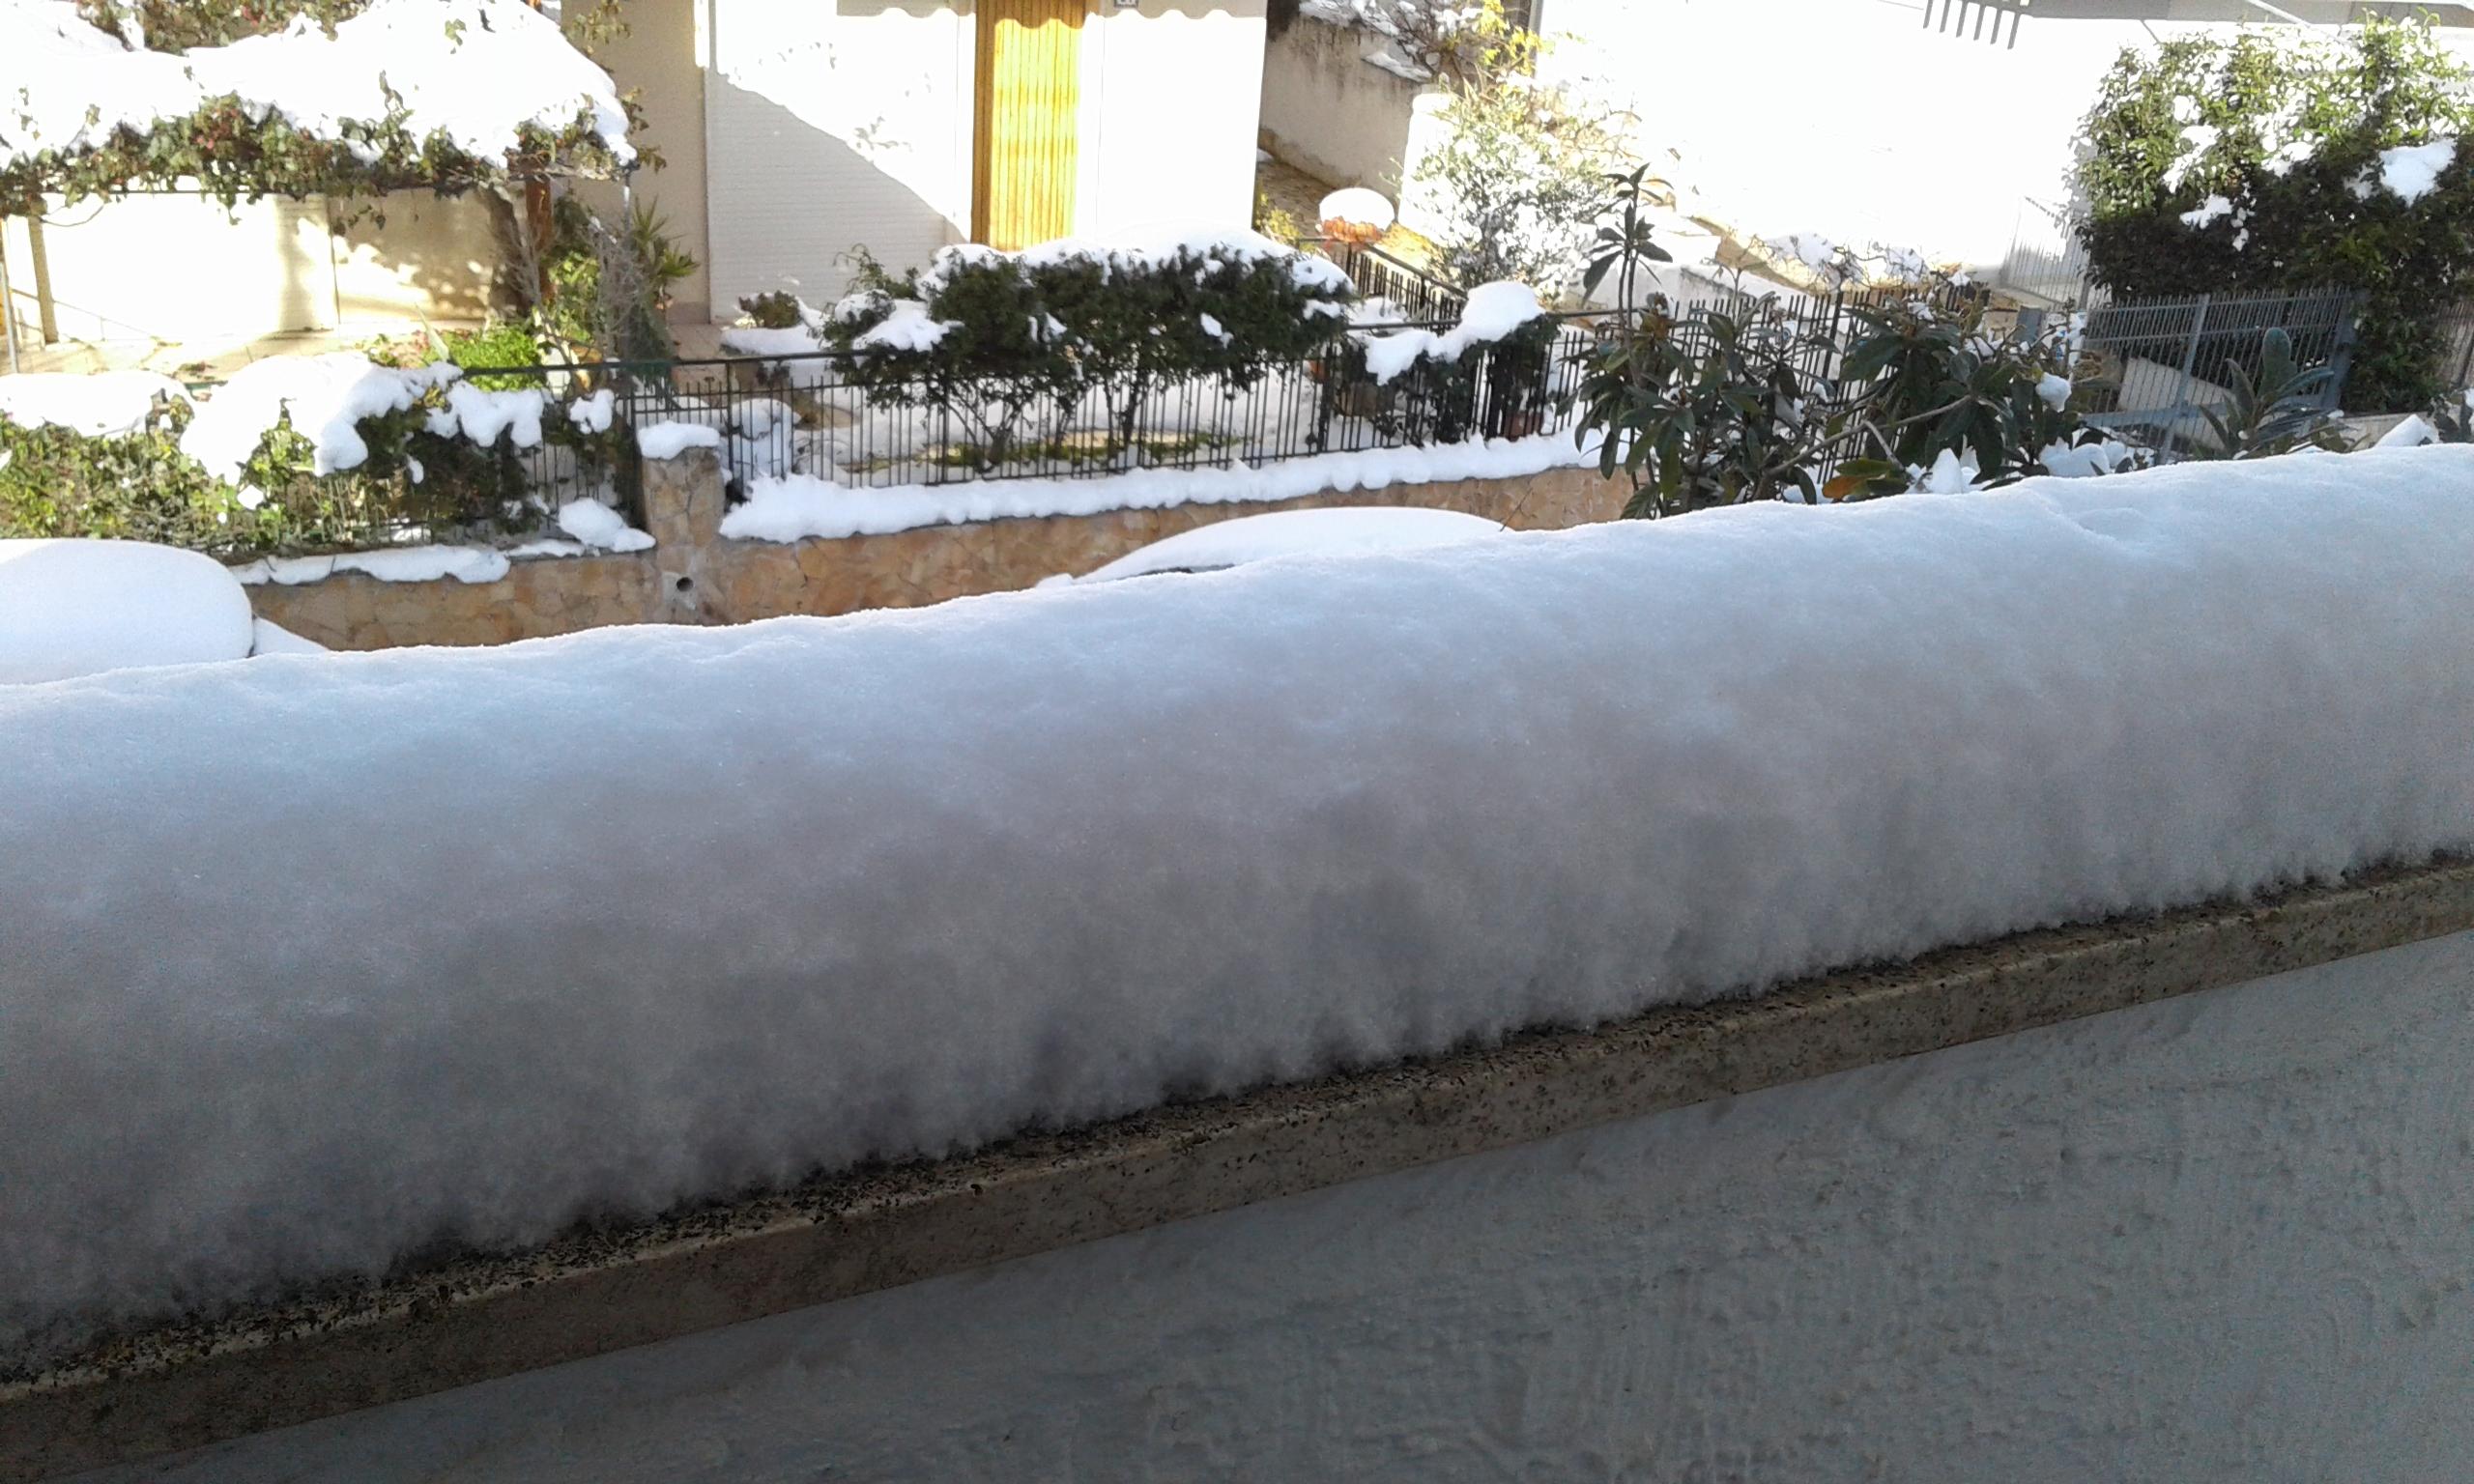 Gelo e neve d'Epifania 2017_qui tutte le FOTO e i VIDEO-20170108_143239.jpg